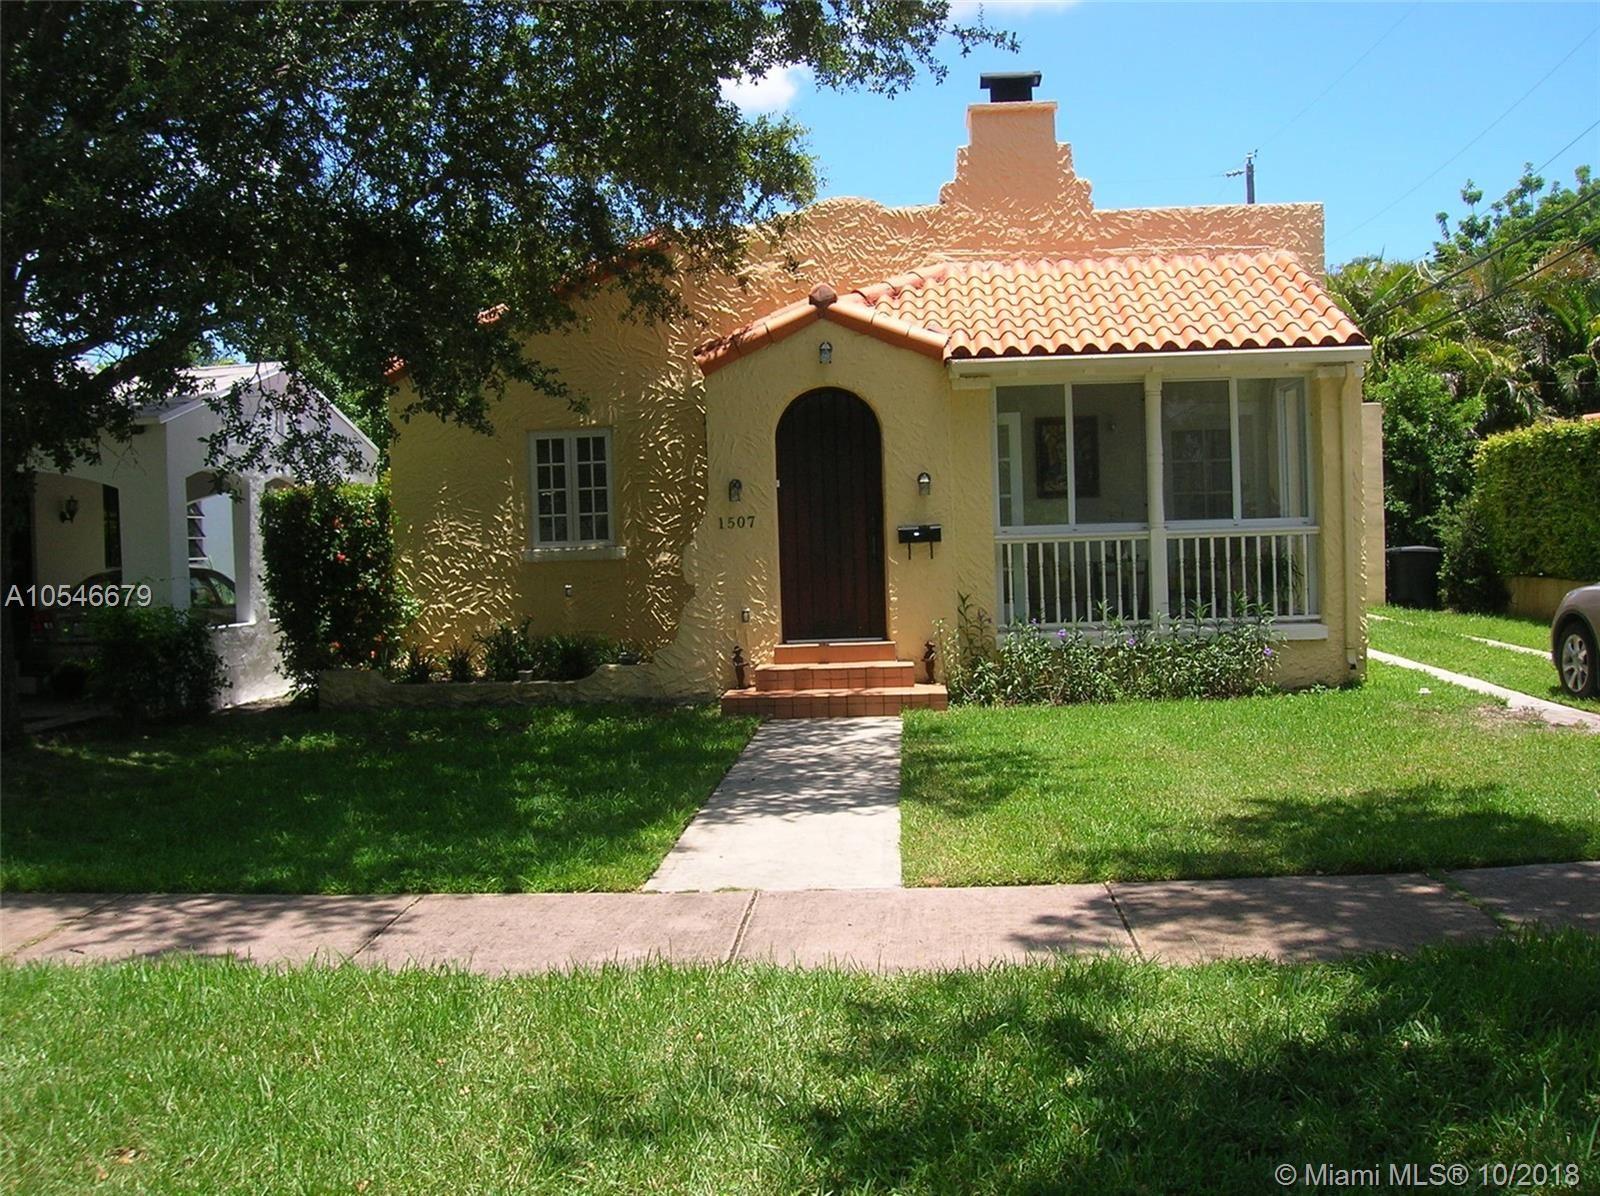 1507 Columbus Blvd, Coral Gables, FL 33134 - #: A10546679